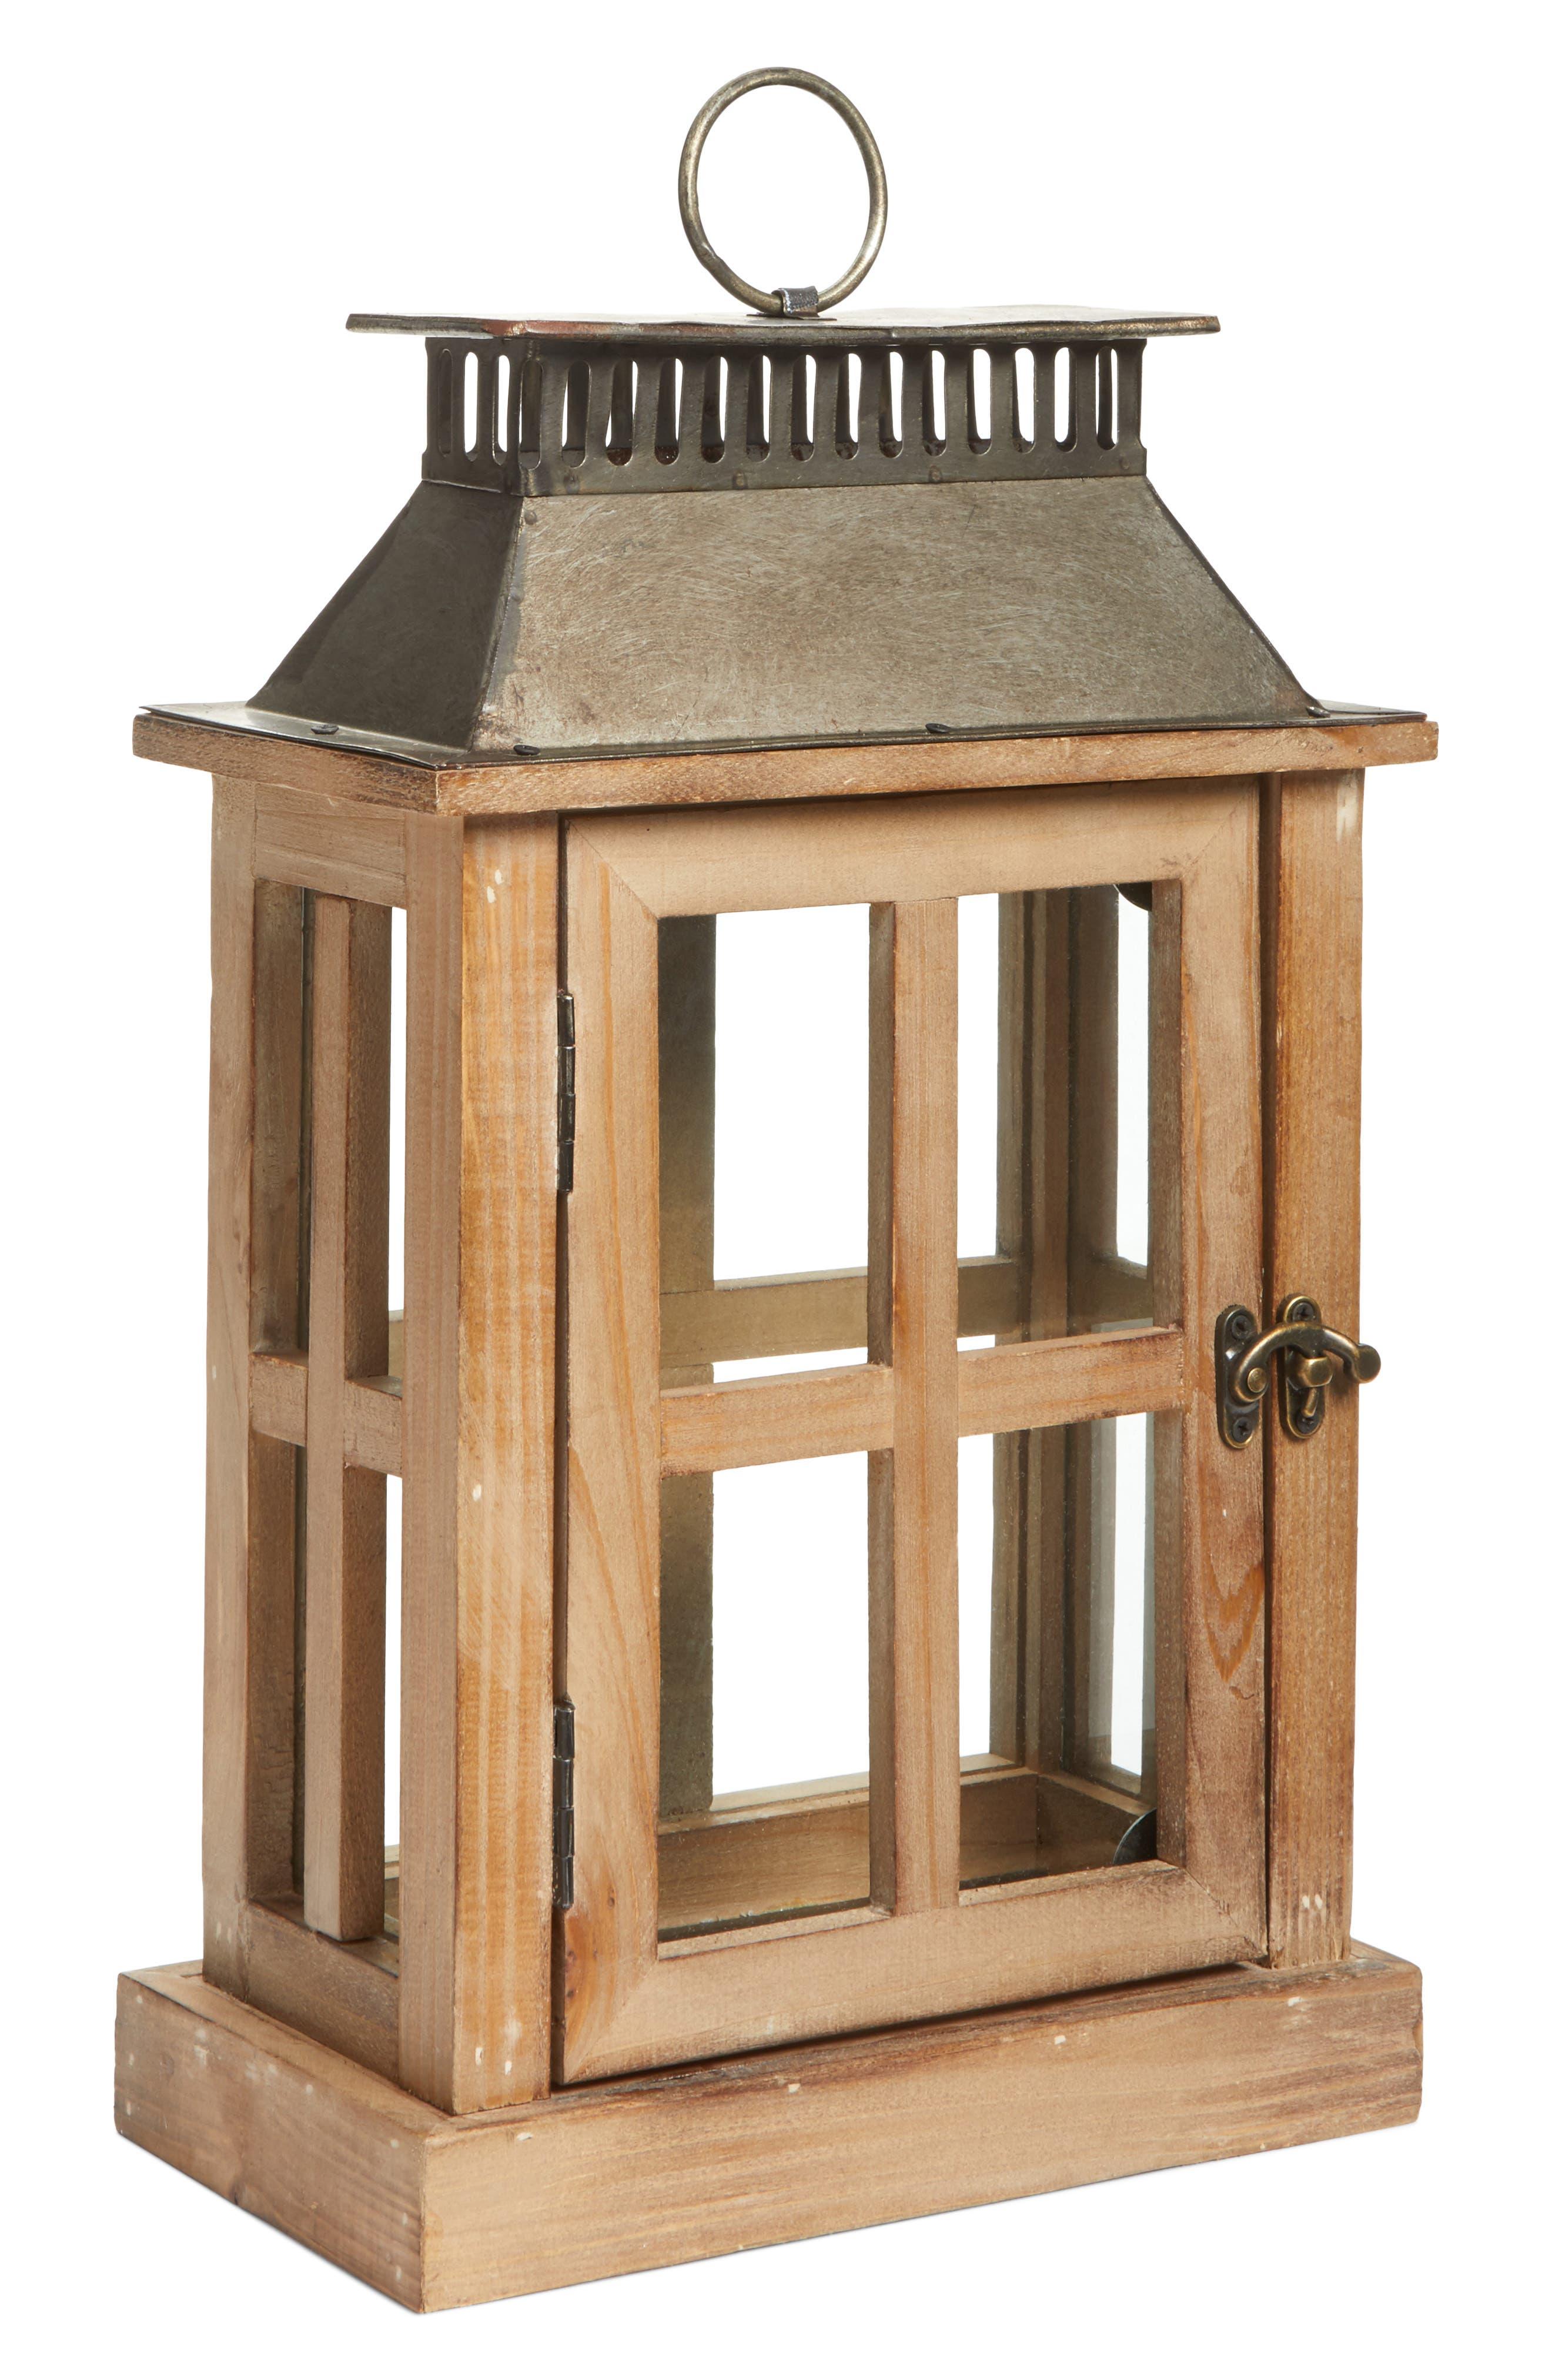 Decorative Wood & Metal Lantern,                             Alternate thumbnail 3, color,                             200